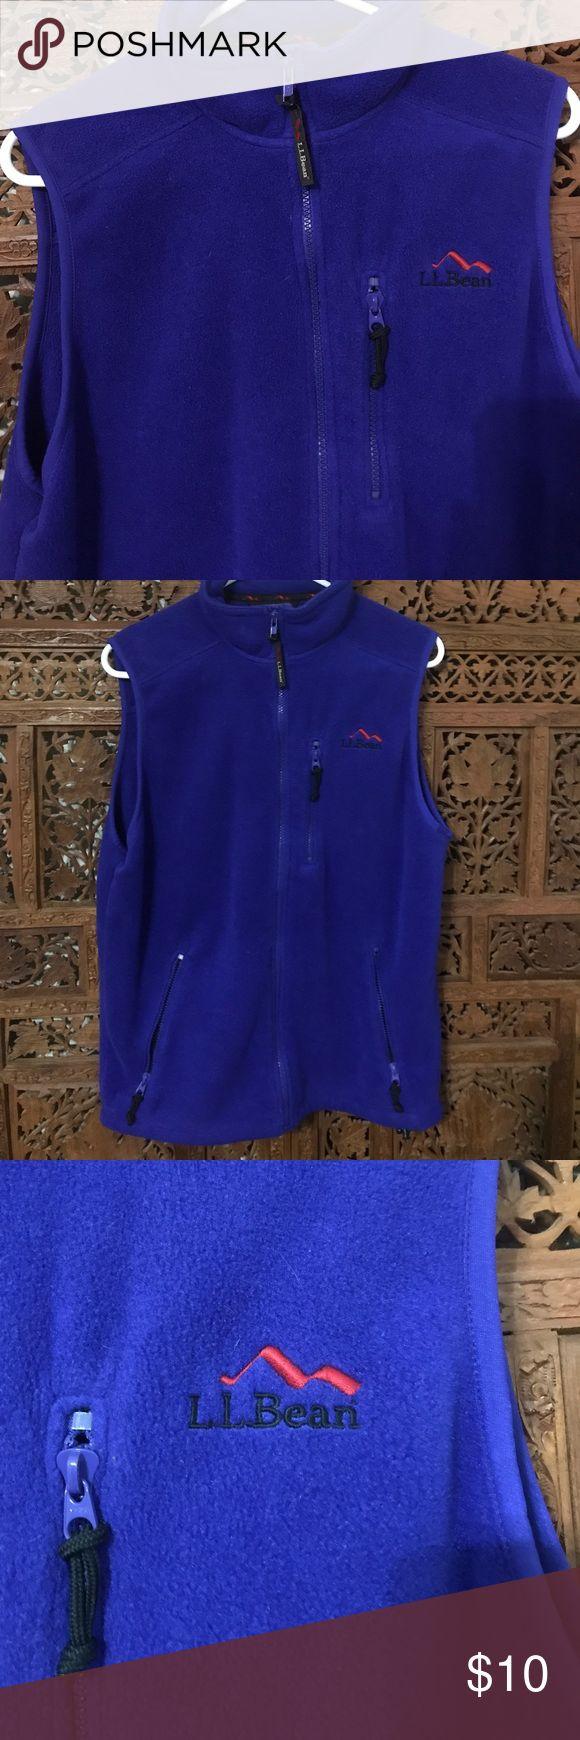 Purple LLBean Fleece Vest Great condition purple vest. Super warm with 3 easy zip pockets. No pulls. Smoke free home. L.L. Bean Jackets & Coats Vests